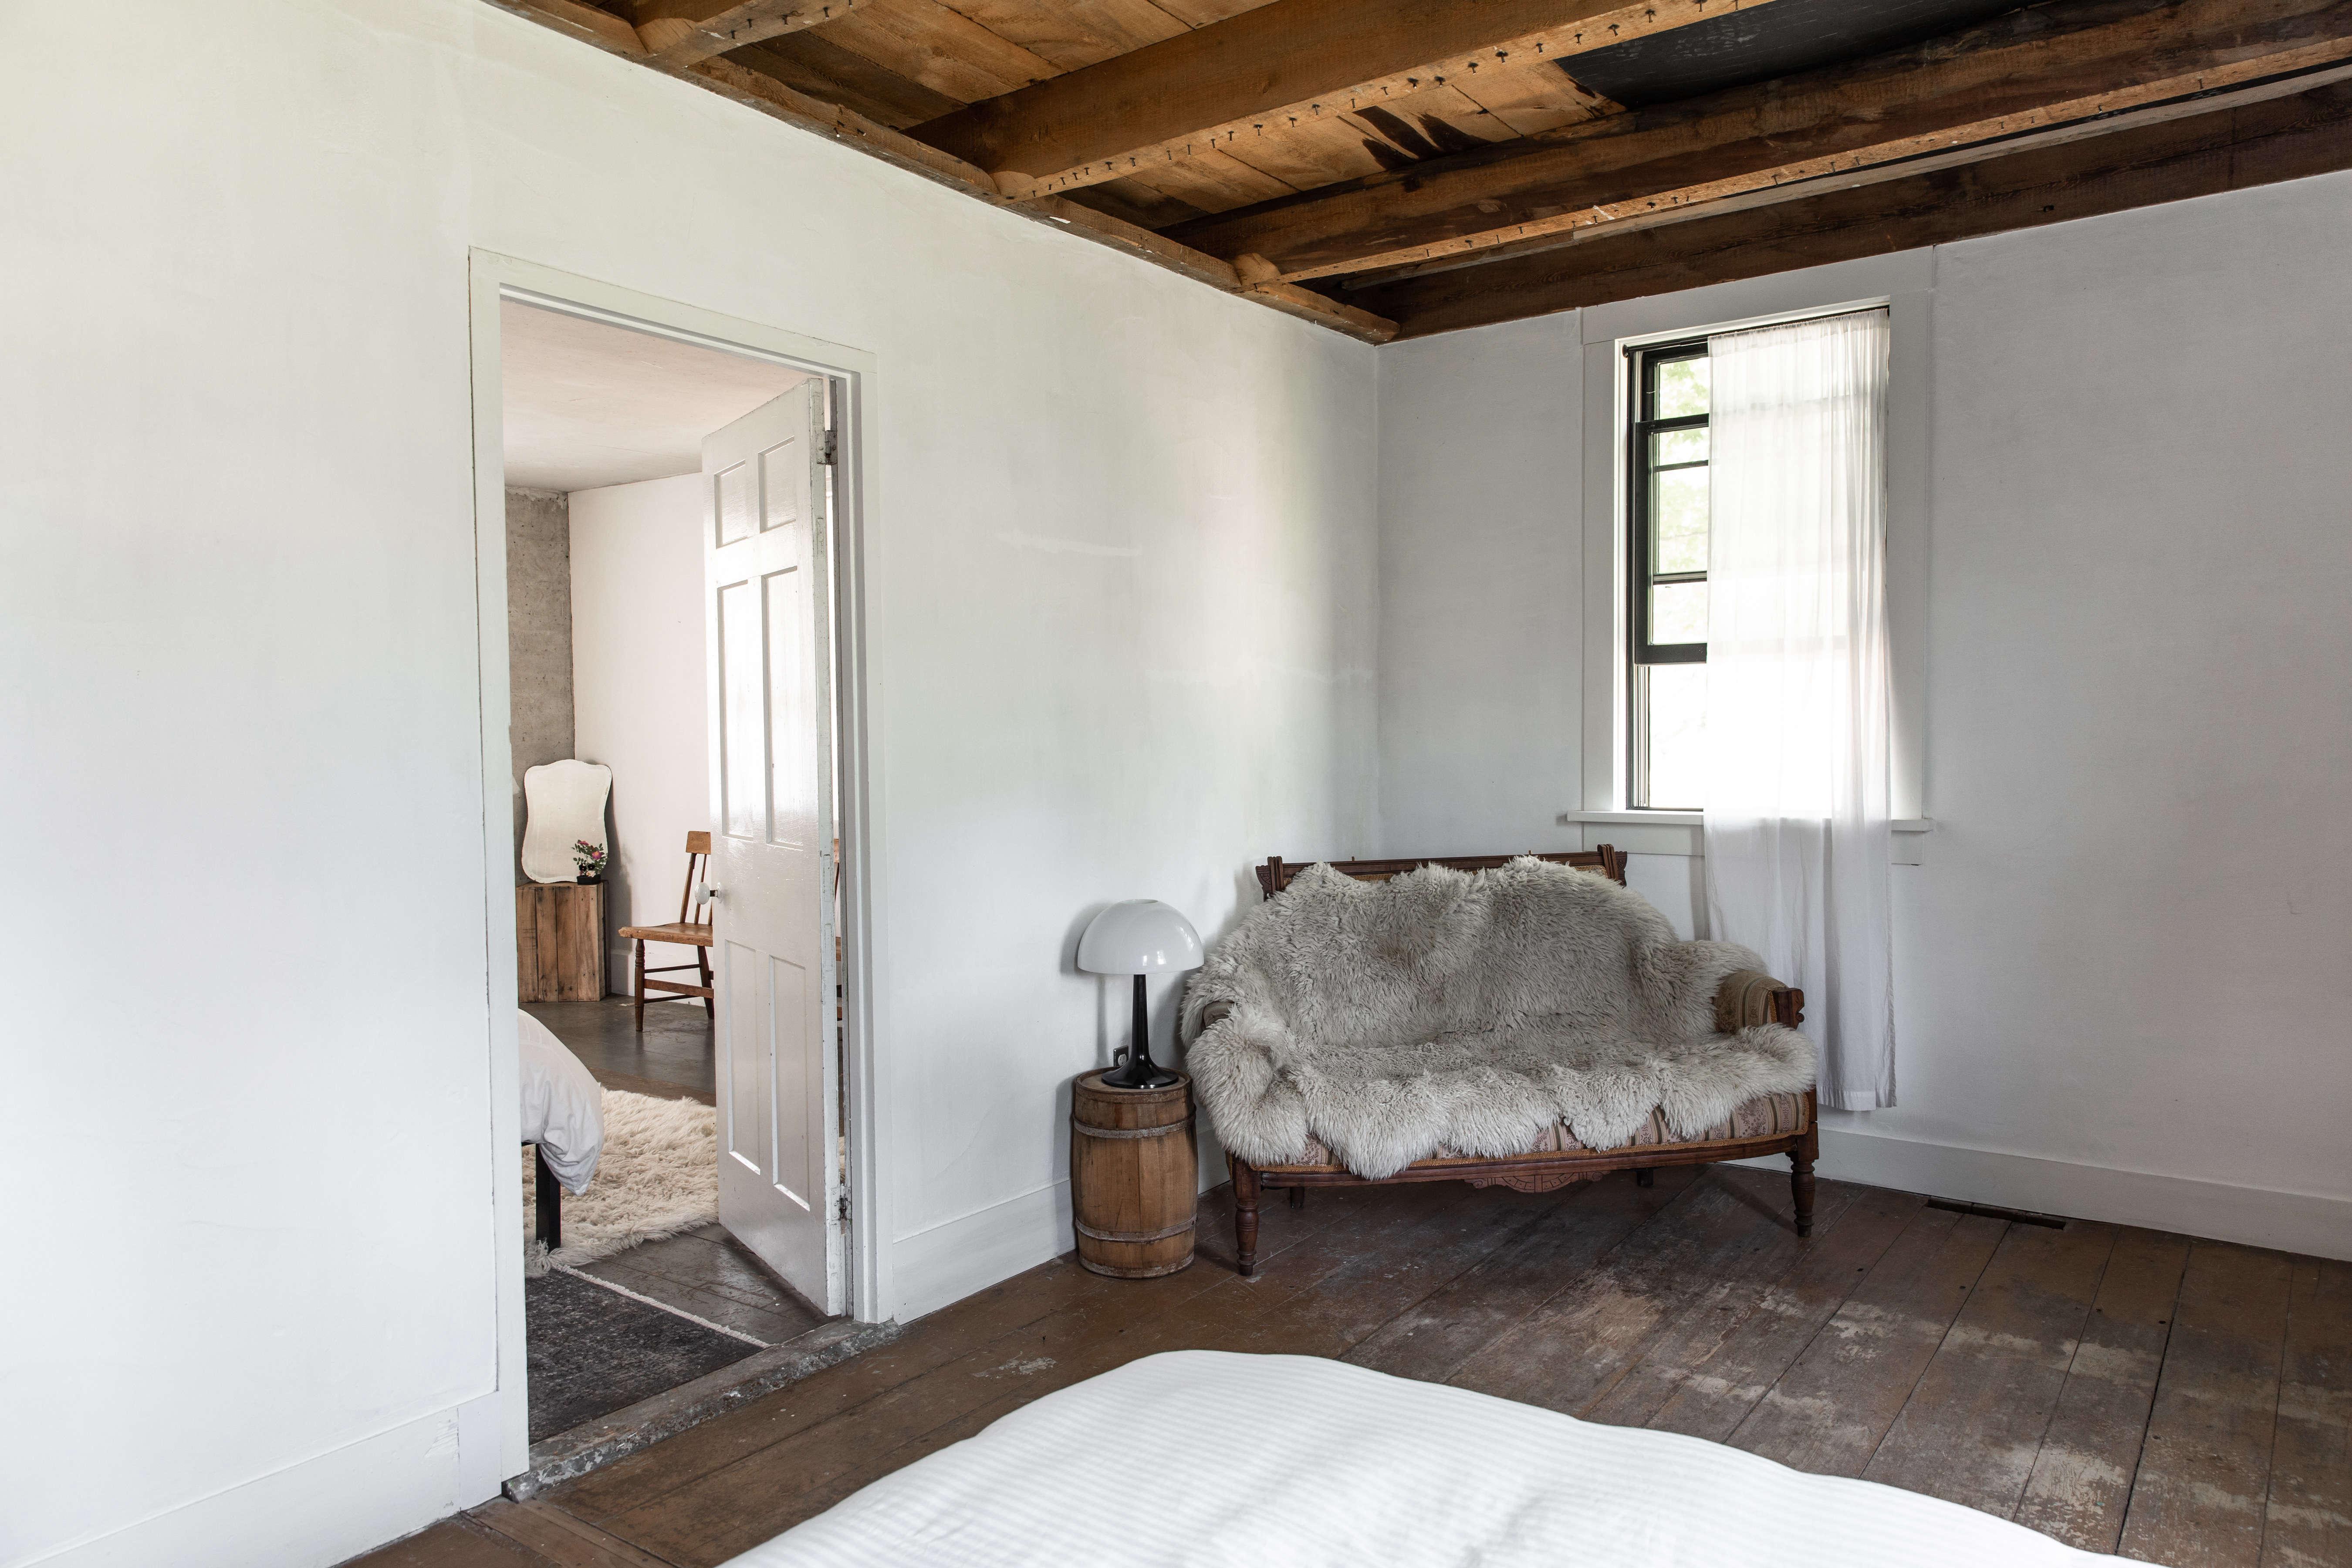 Renovating An Old Farmhouse